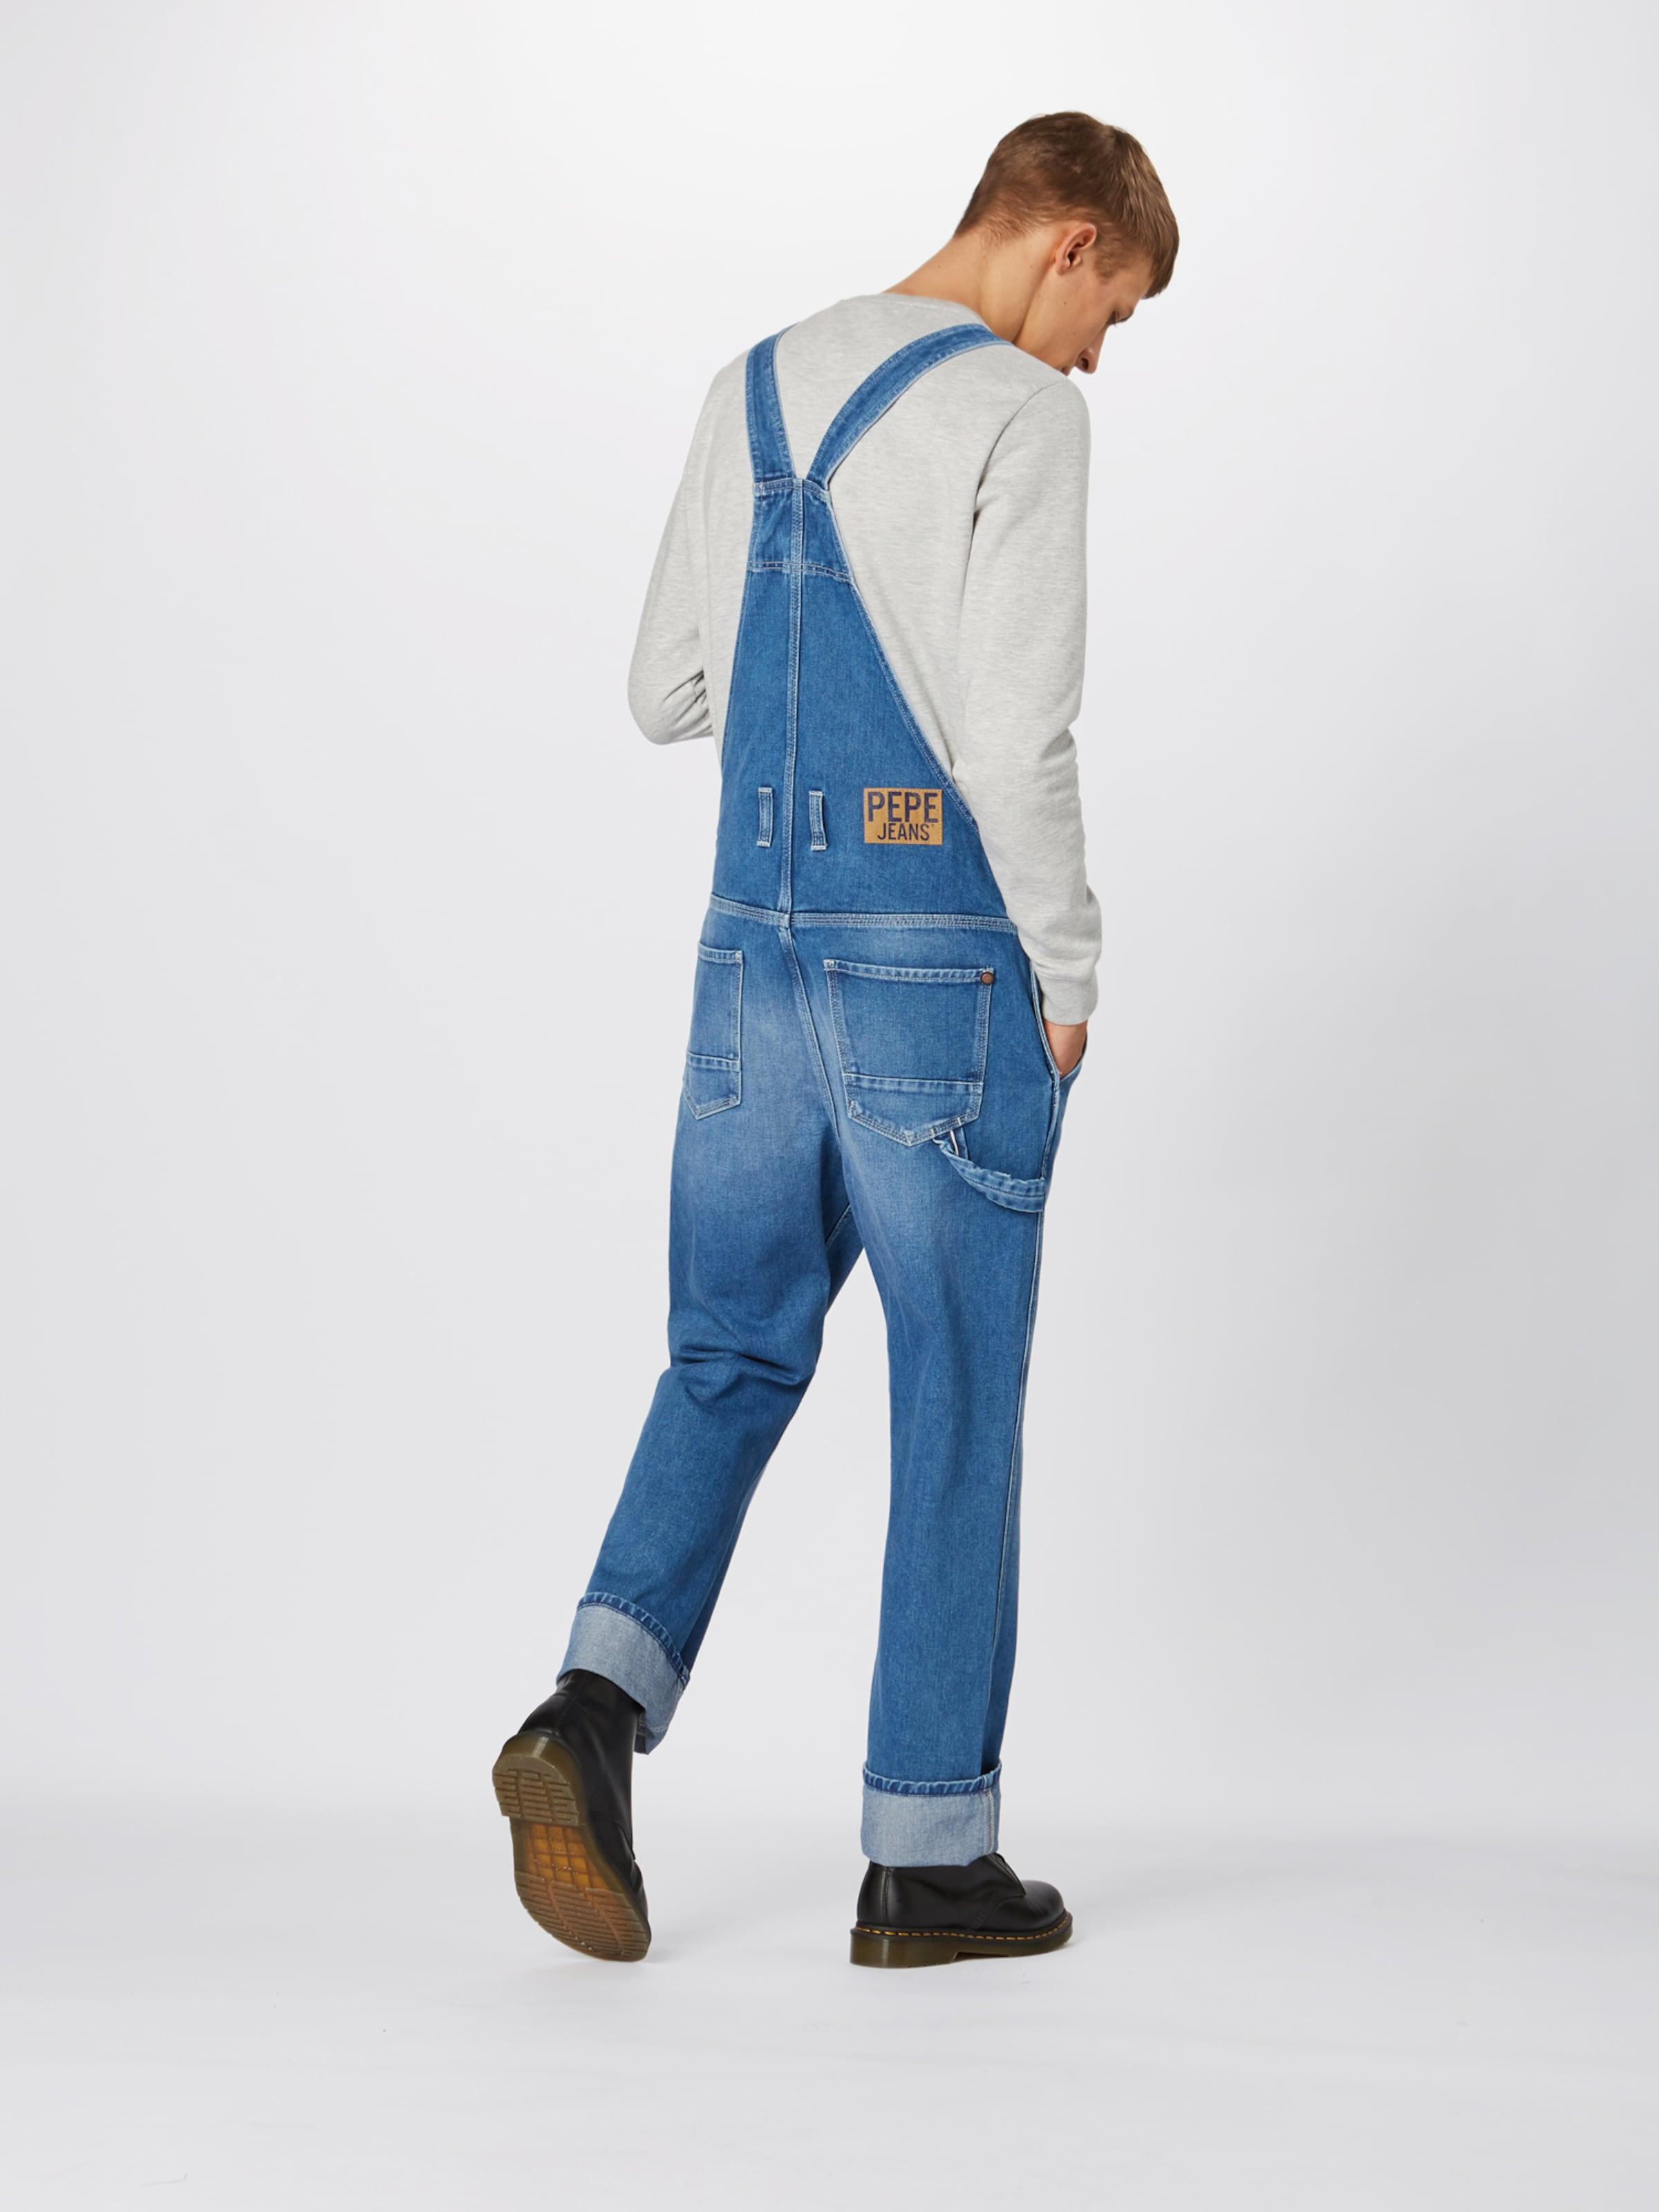 En Hammer' Bleu Pepe Denim 'dougie Salopette Jean Jeans QCxrdEBeWo